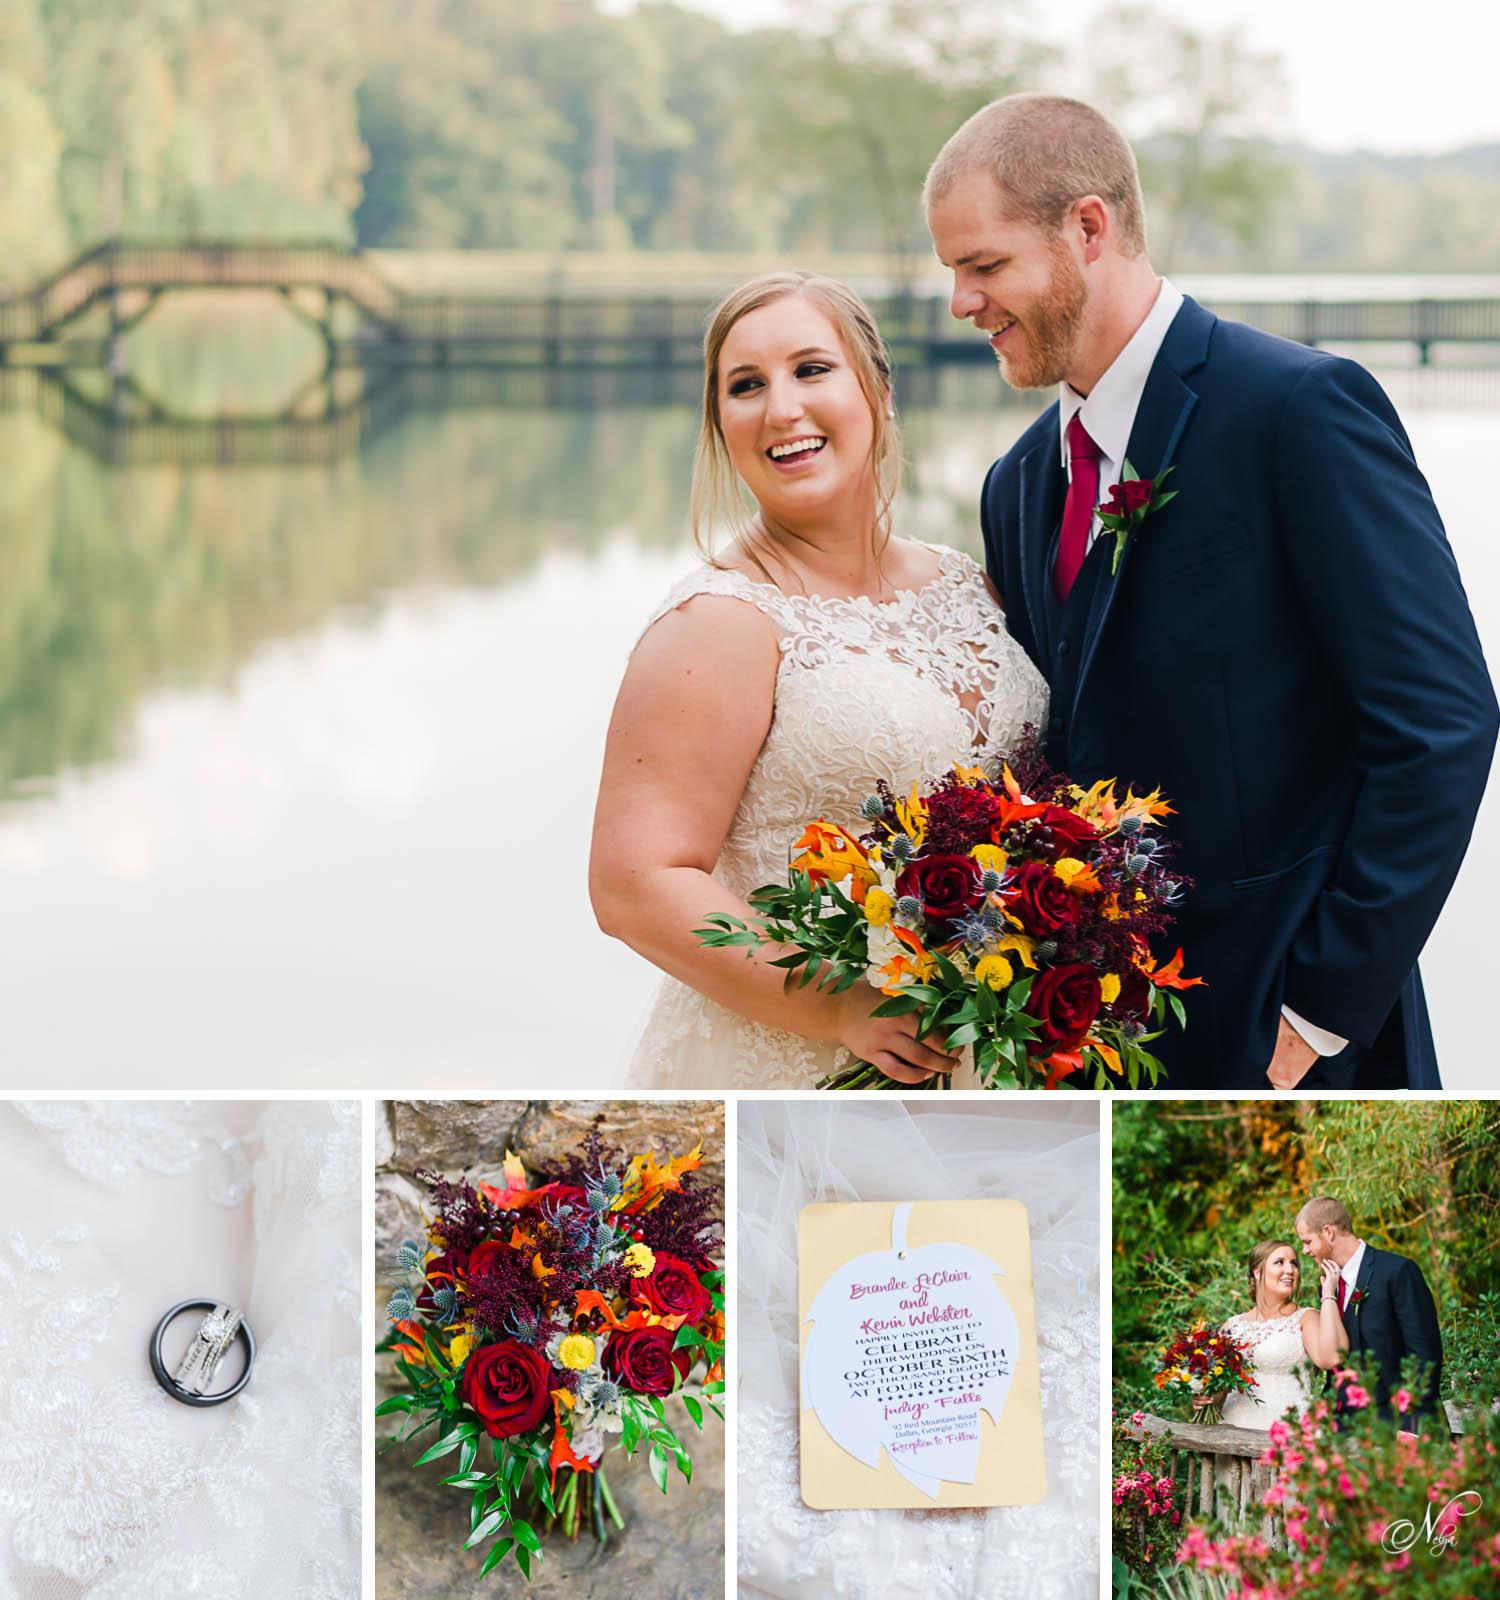 Brandee + Kevin | Indigo Falls Wedding